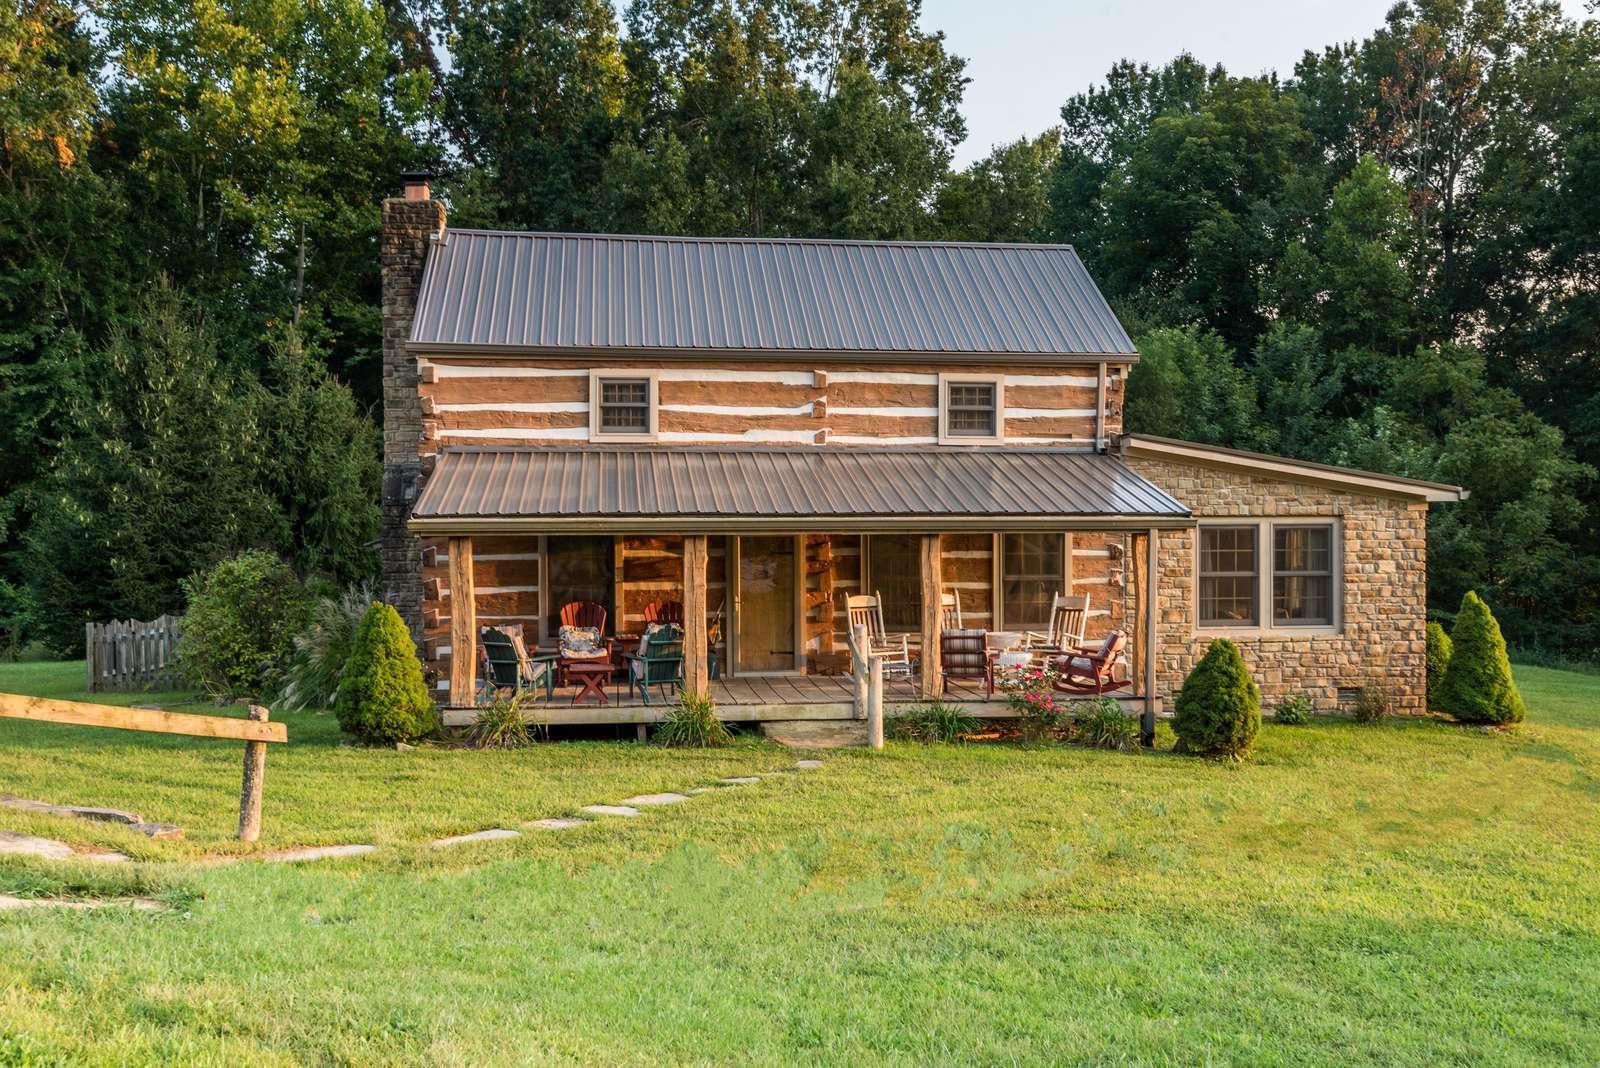 Hawks Haven Log Cabin - property